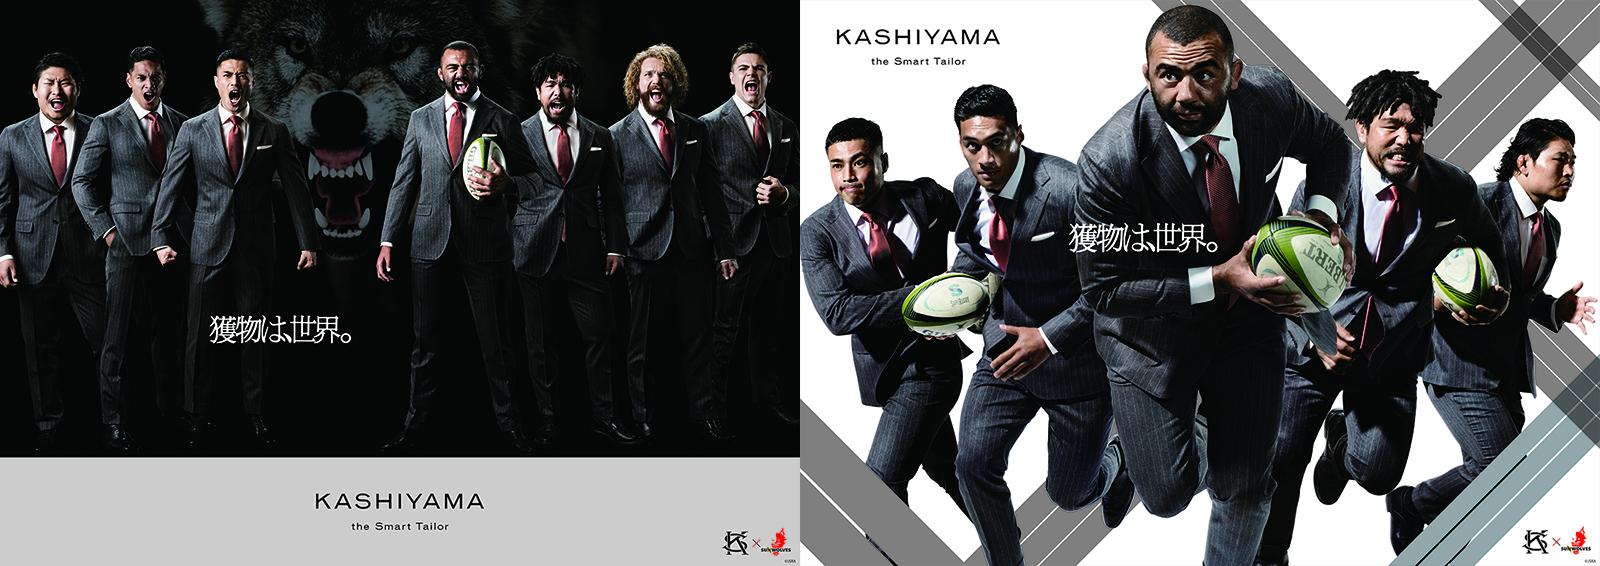 KASHIYAMA theSmartTailor_2018poster